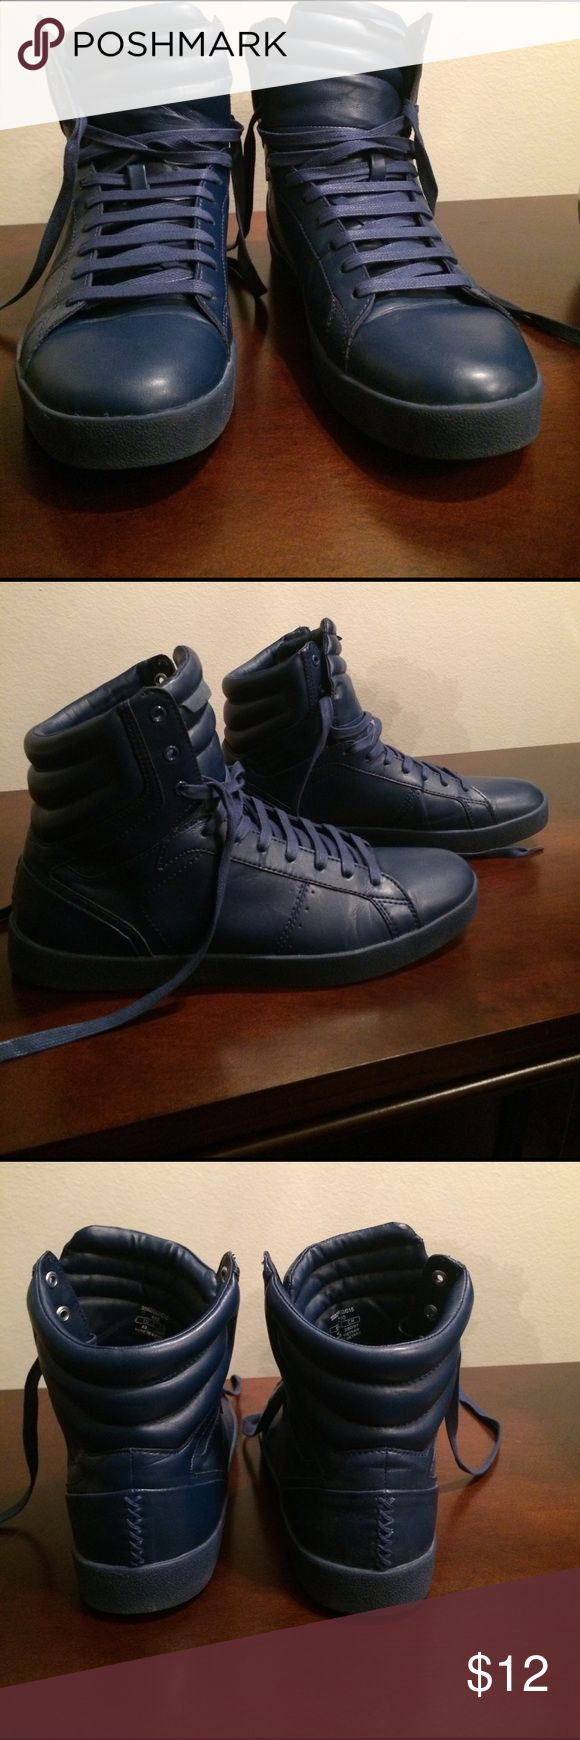 Blue Zara High top Shoes Blue Zara Man High Tops - Size 43 - Worn once Zara Shoes Sneakers